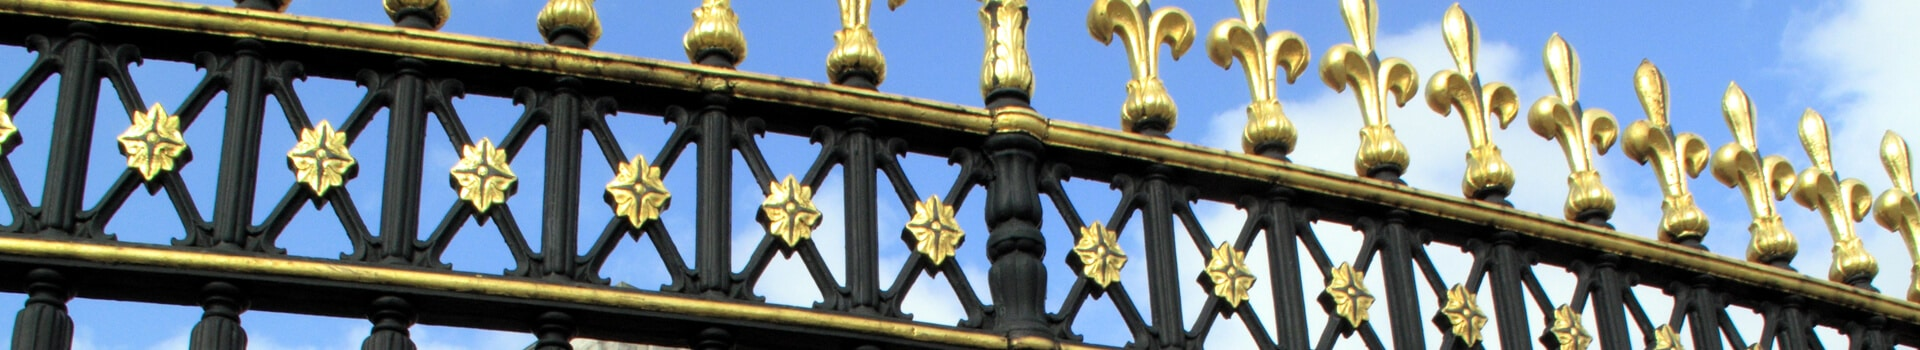 Wrought Iron Fence Type